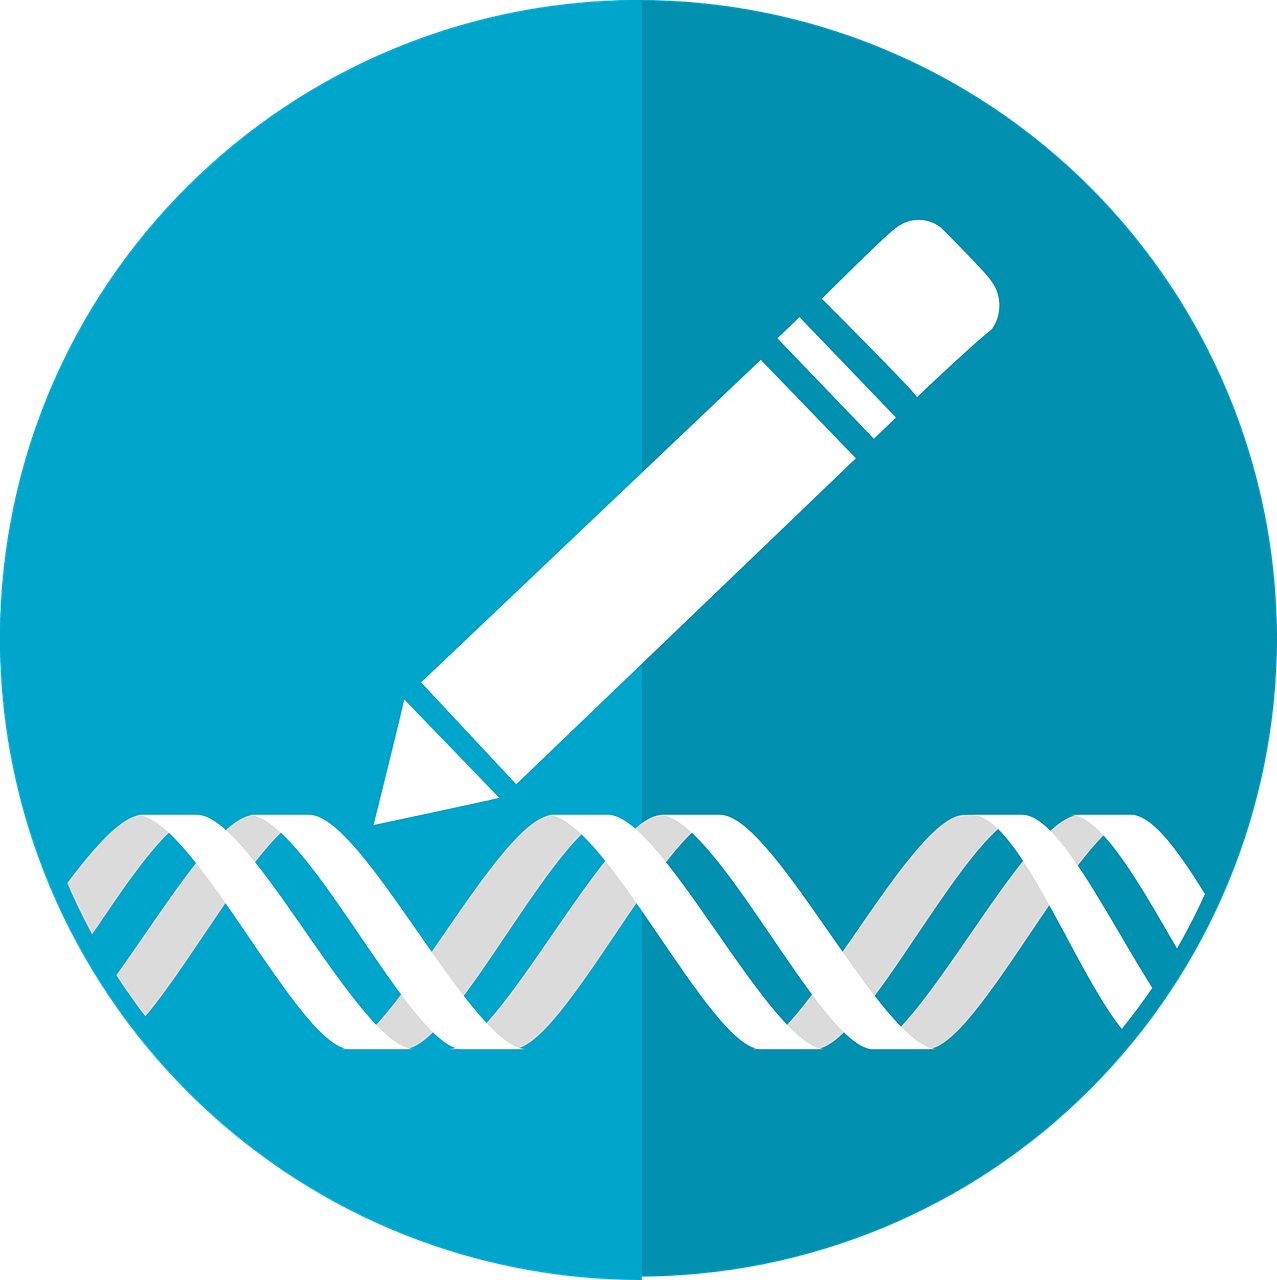 gene editing icon 2375787 1280